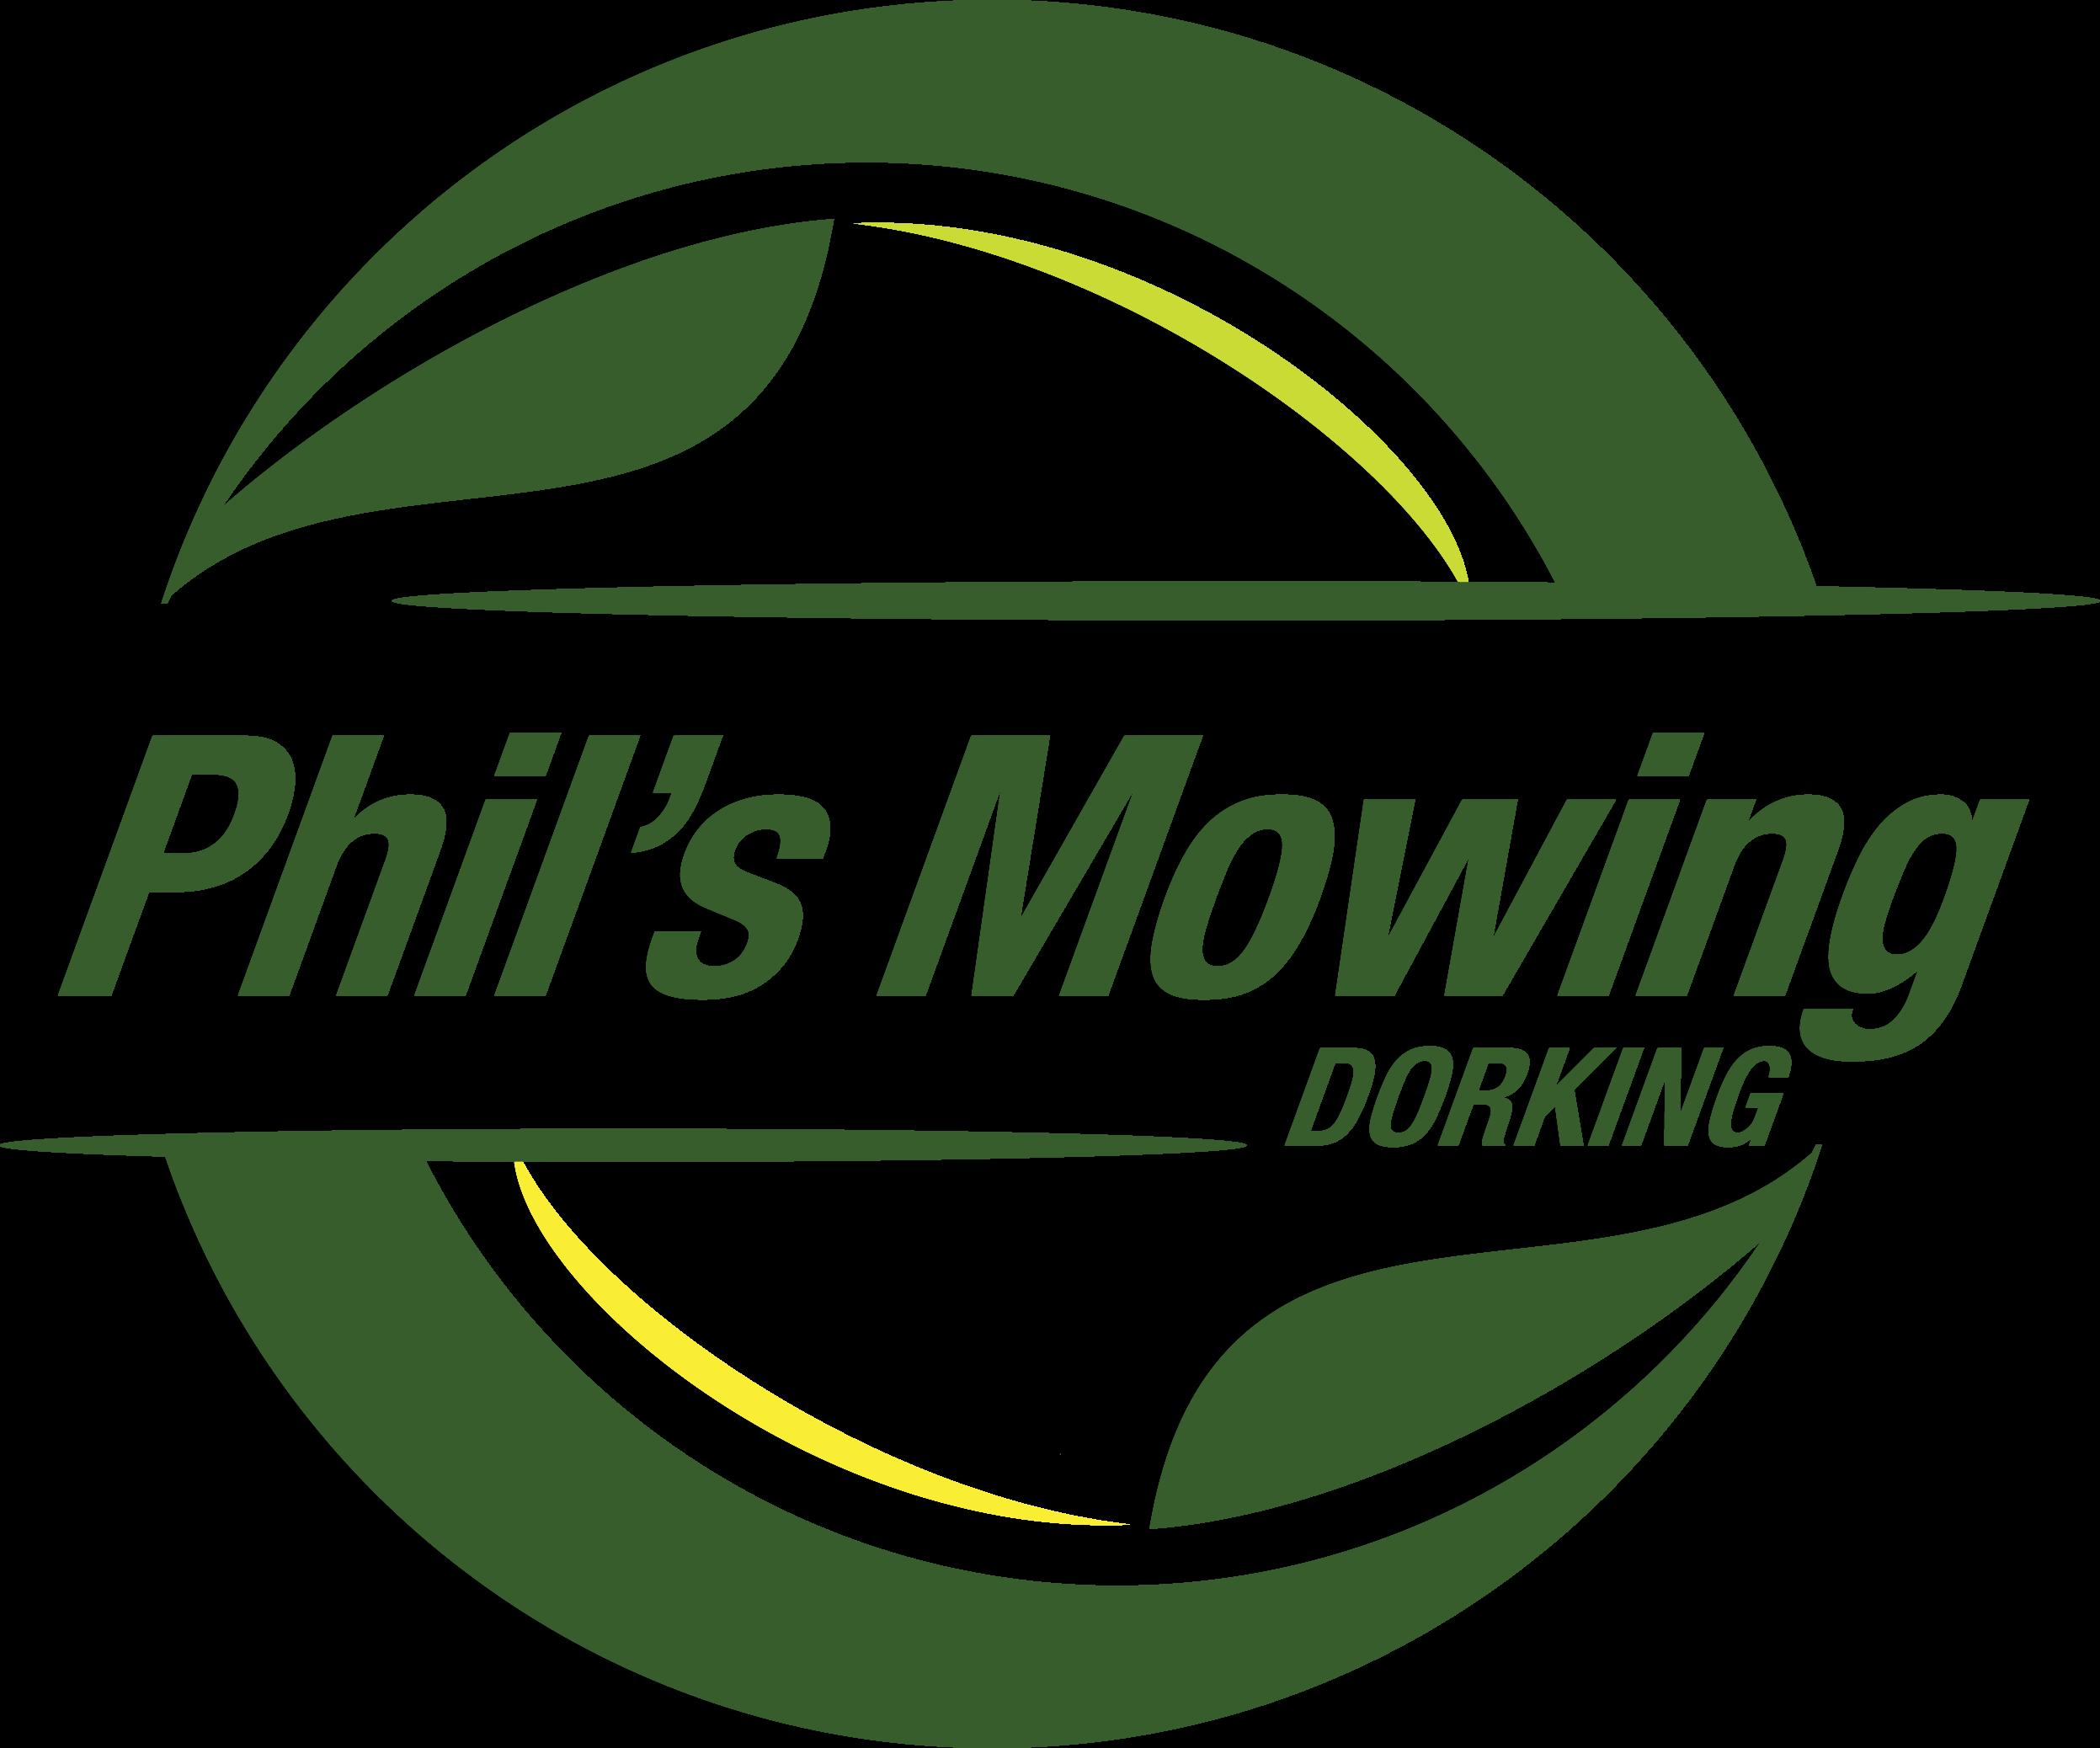 Phil's Mowing Dorking